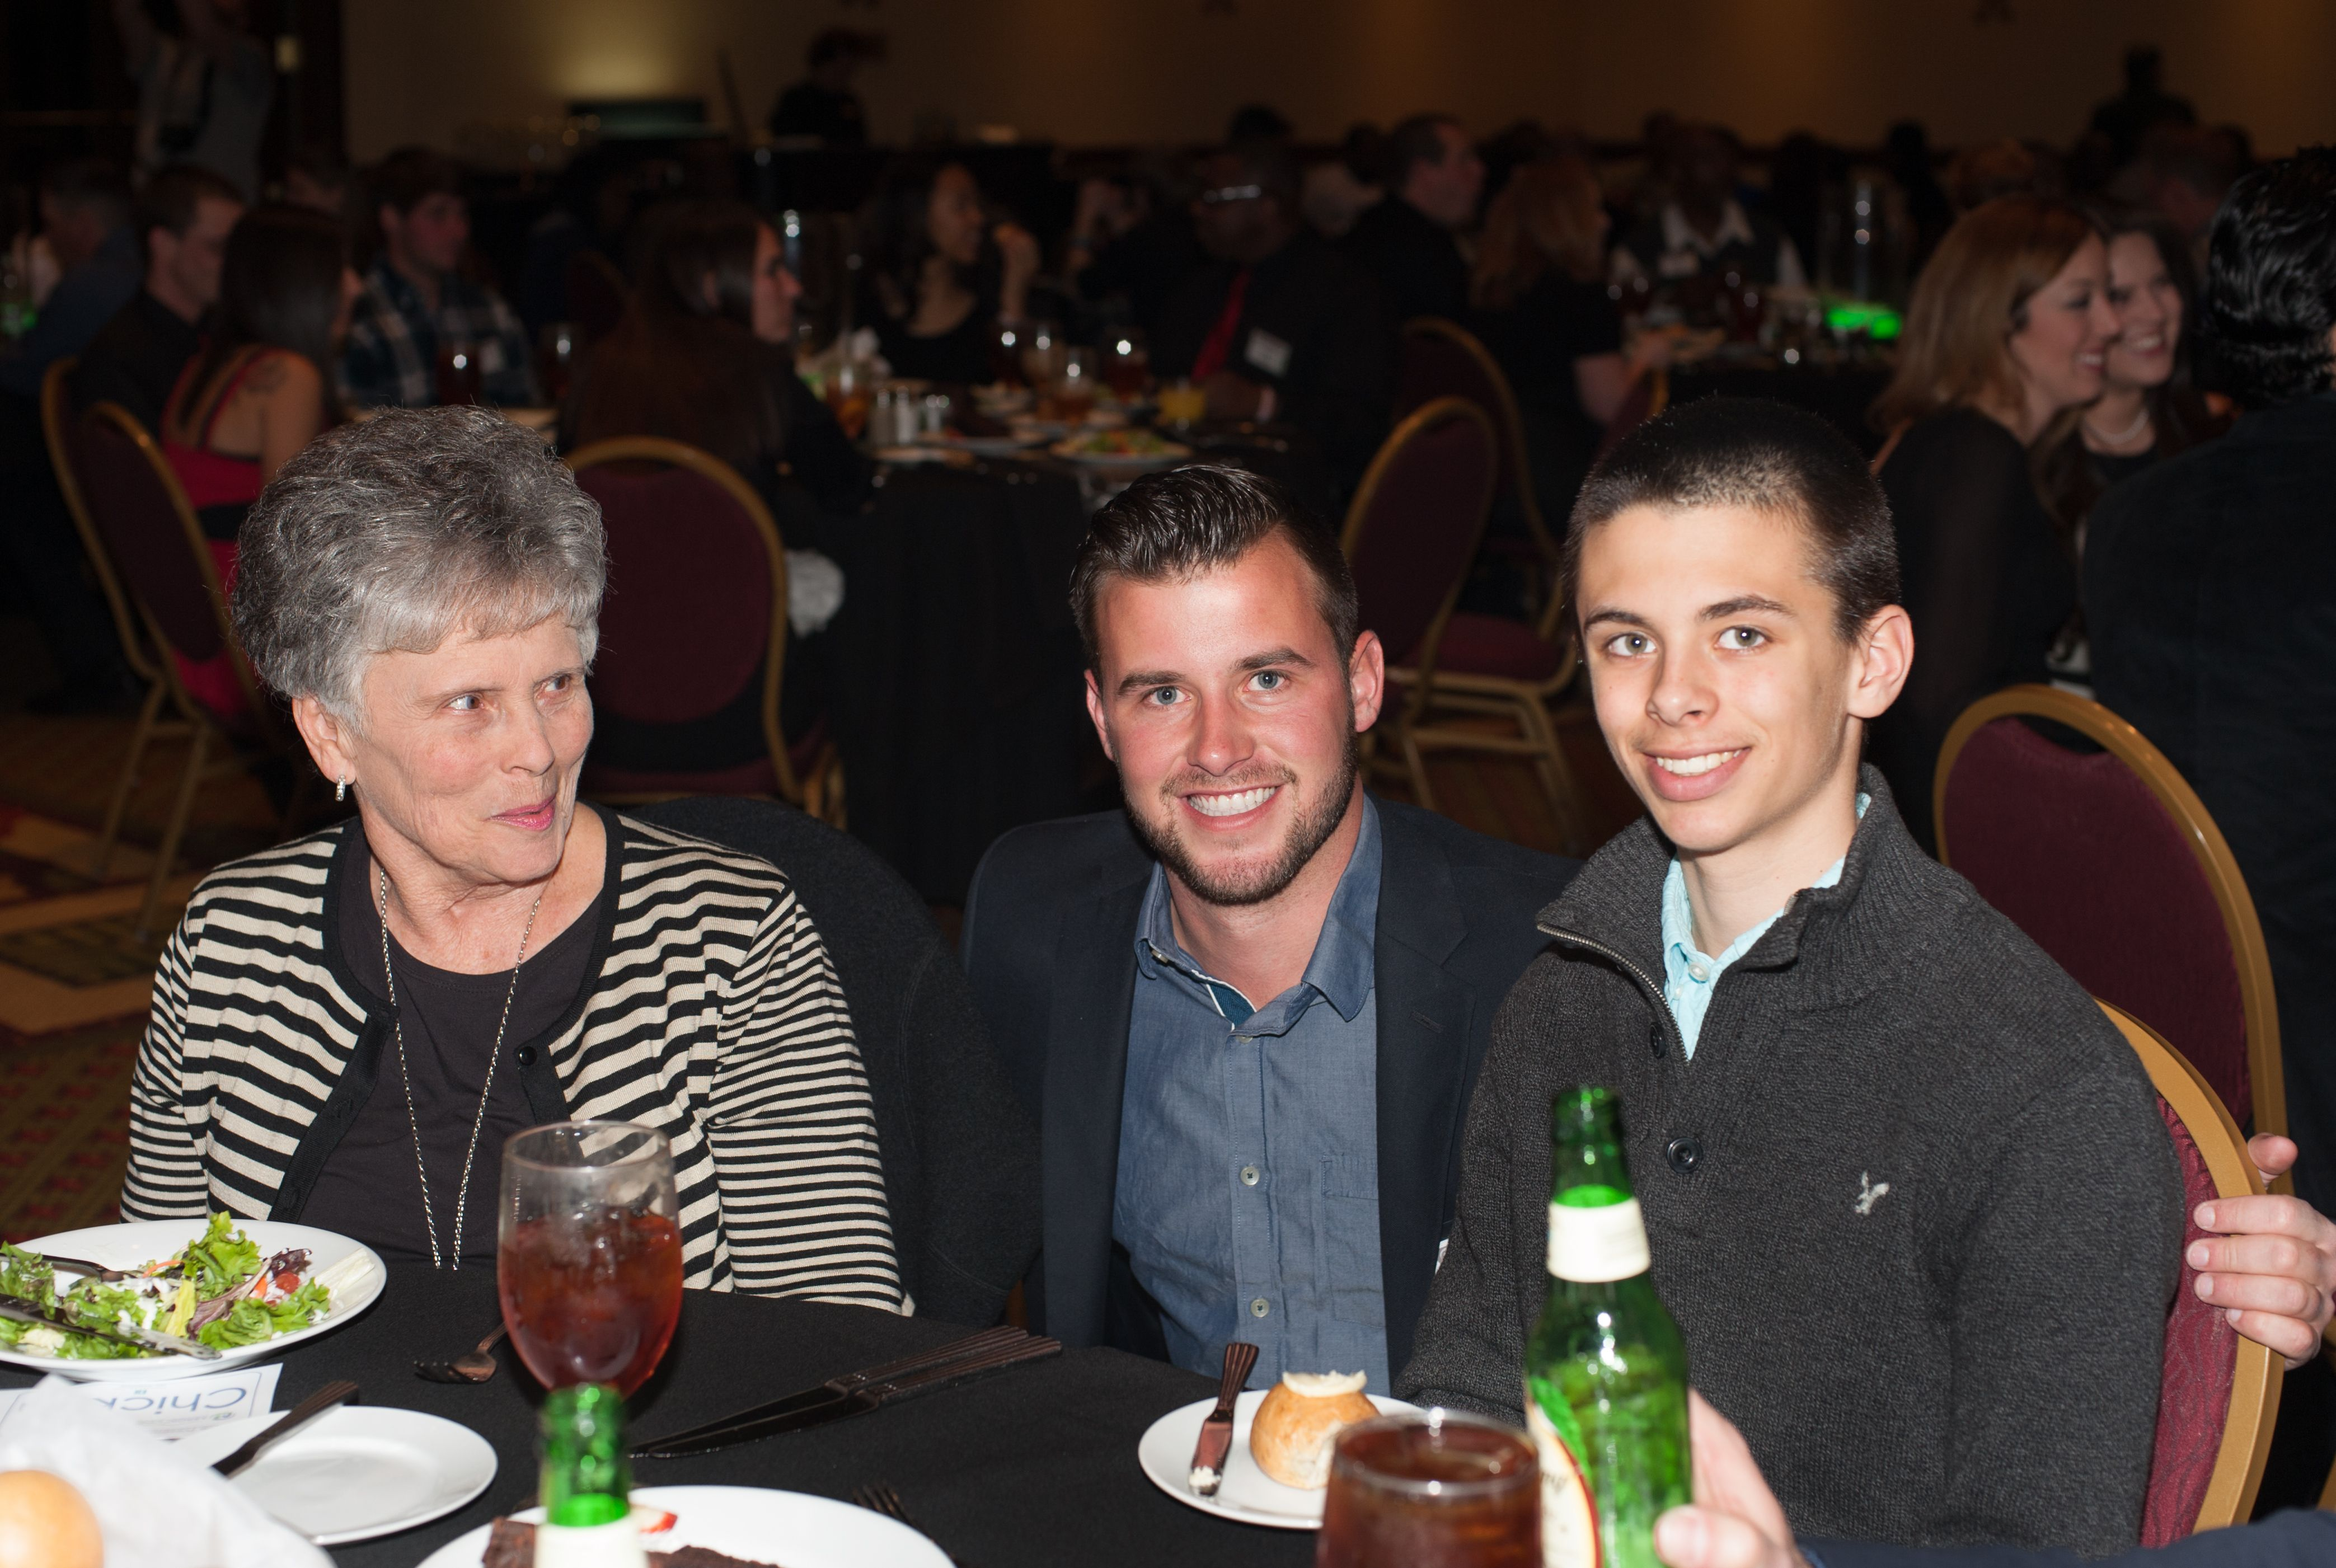 Mary Ann Minor, Zach Jones, PDR technician and Gavin Minor.